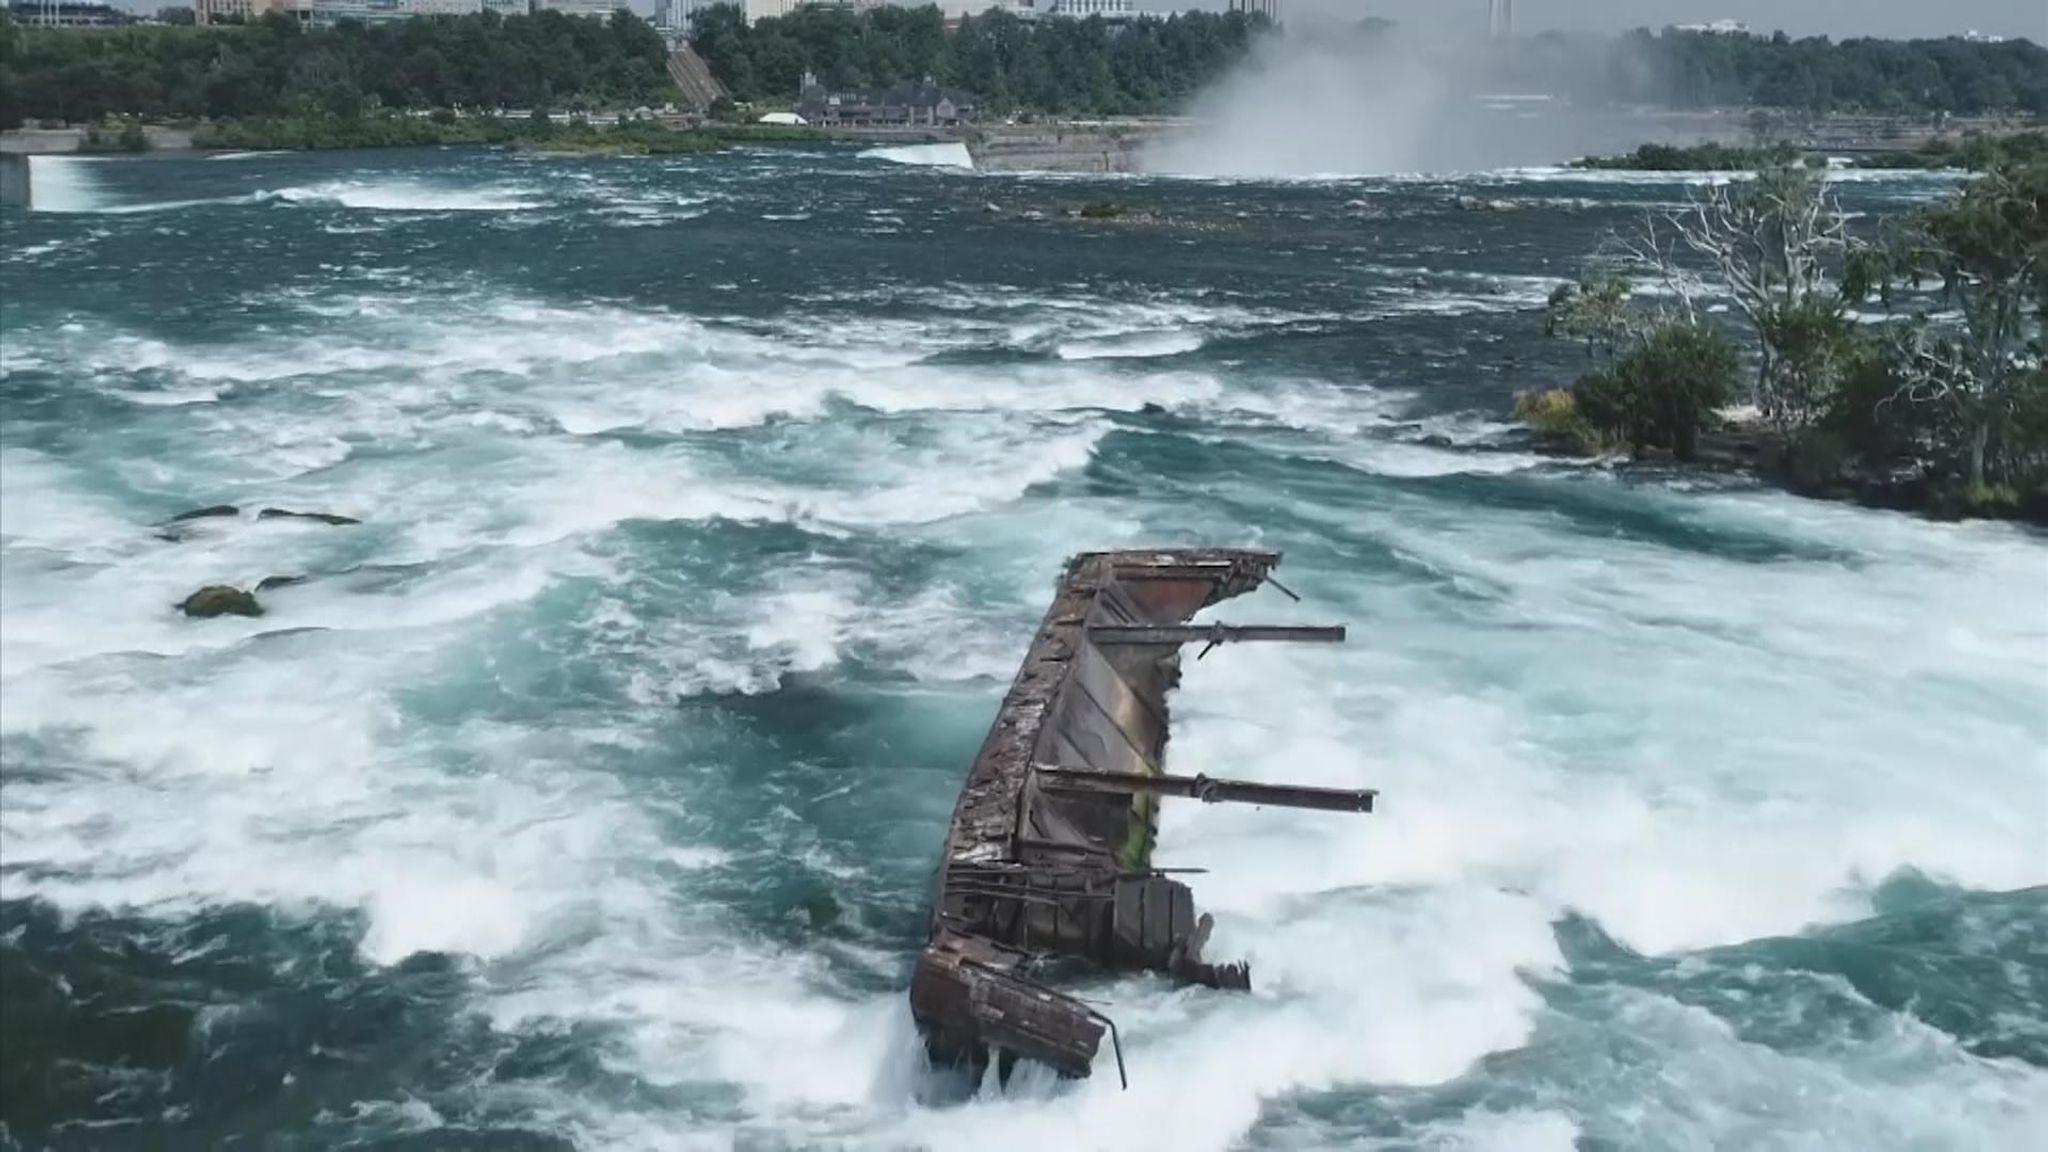 Niagara Falls Barge Stuck In Rapids For 100 Years Finally